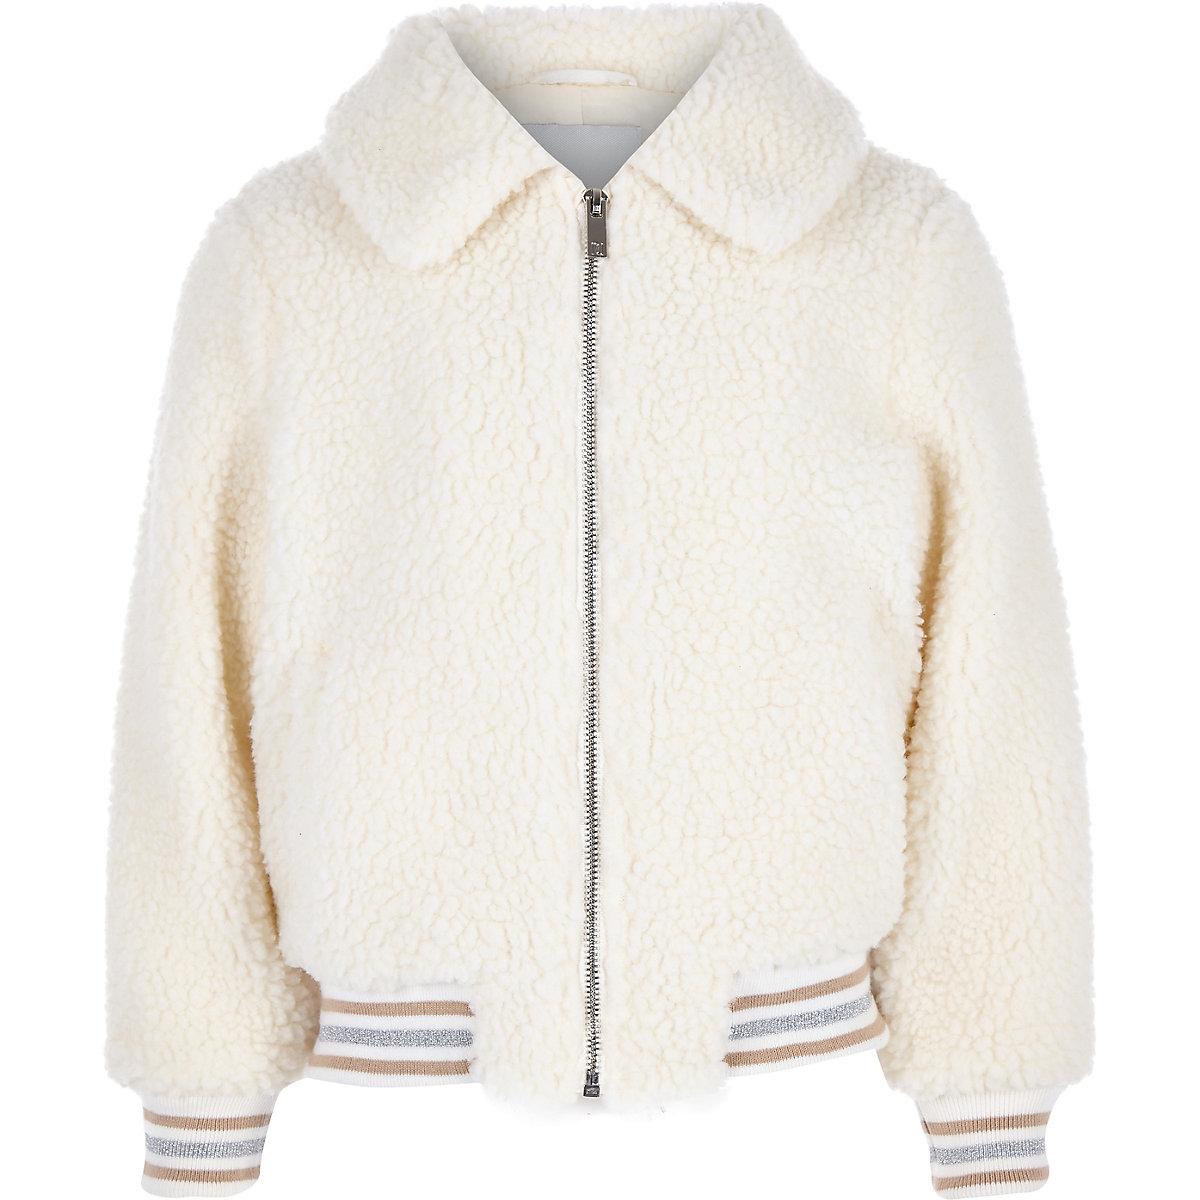 Girls cream fleece bomber jacket